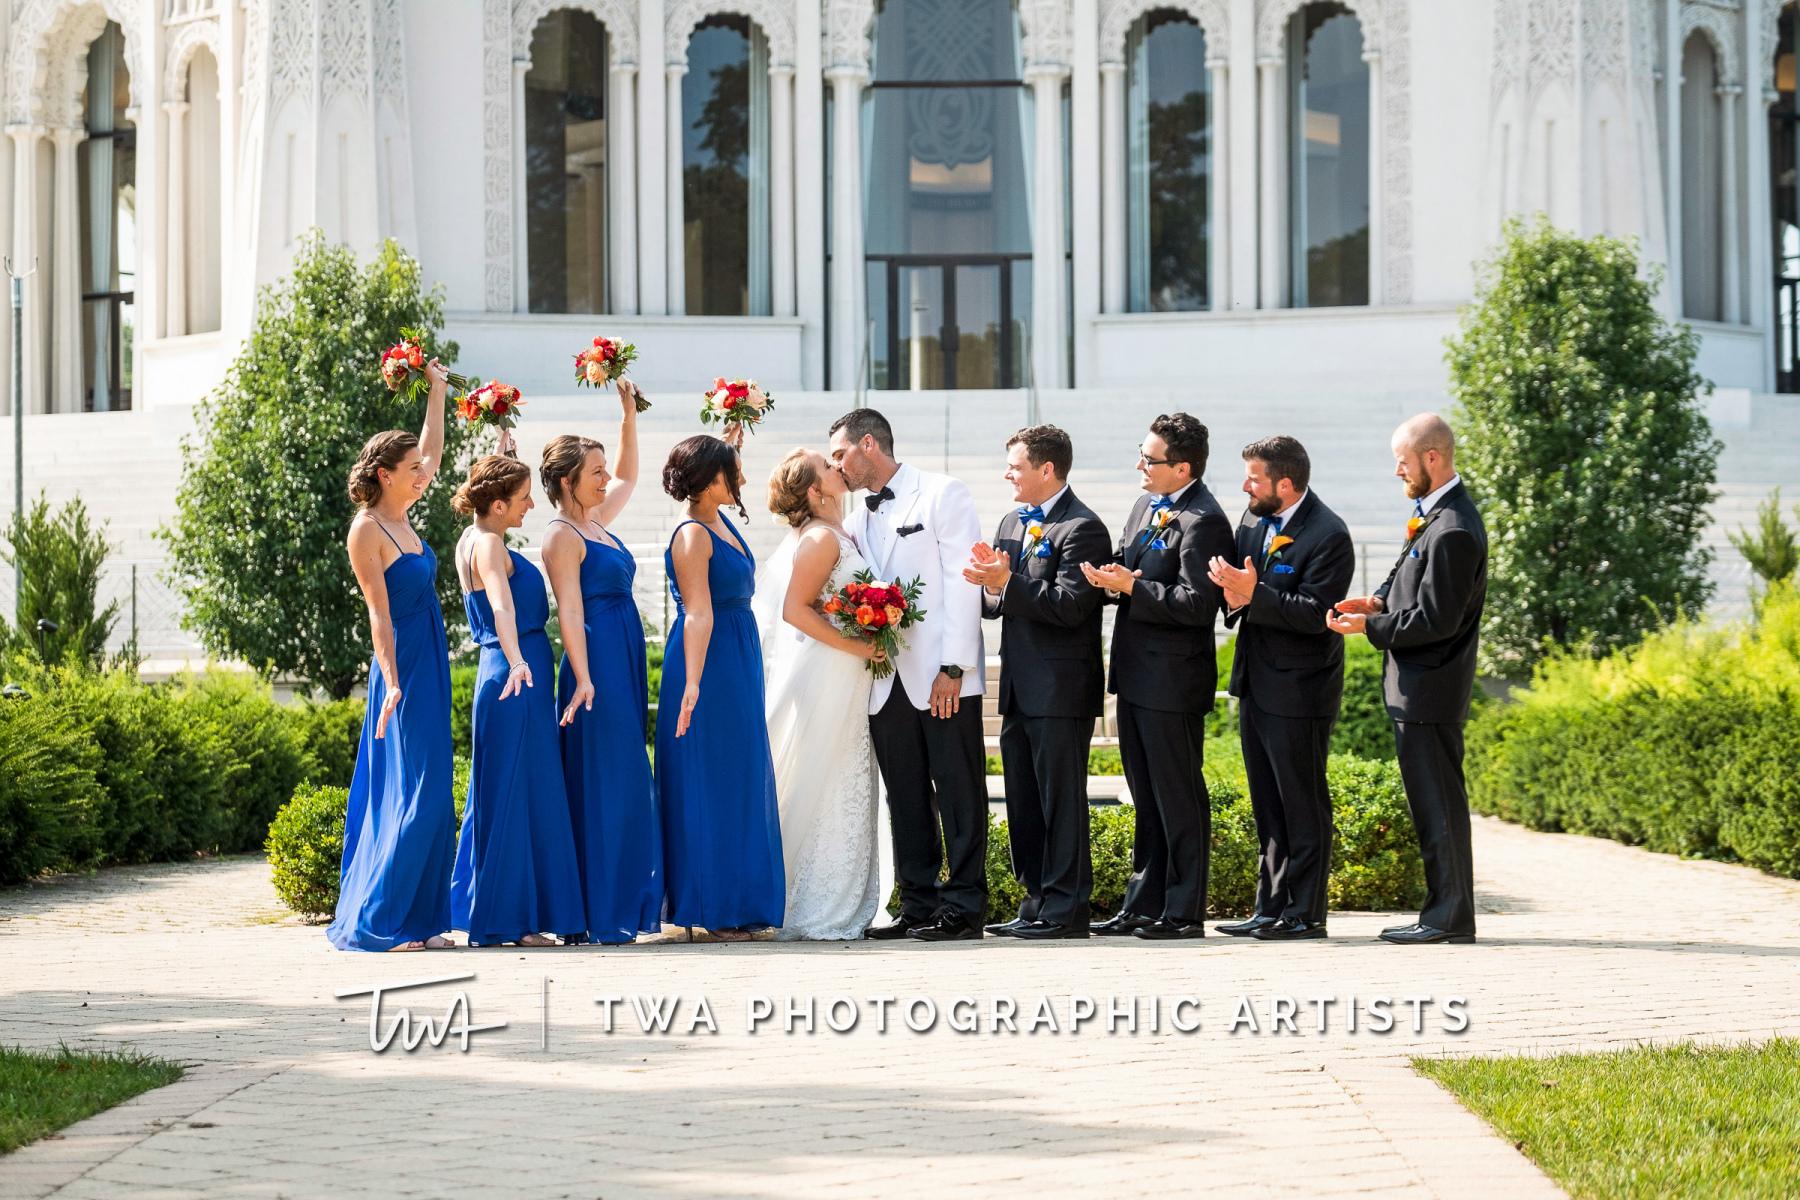 Chicago-Wedding-Photographers-Renaissance-Hotel_Hohensee_Fleishman_JG_DK-044-0321